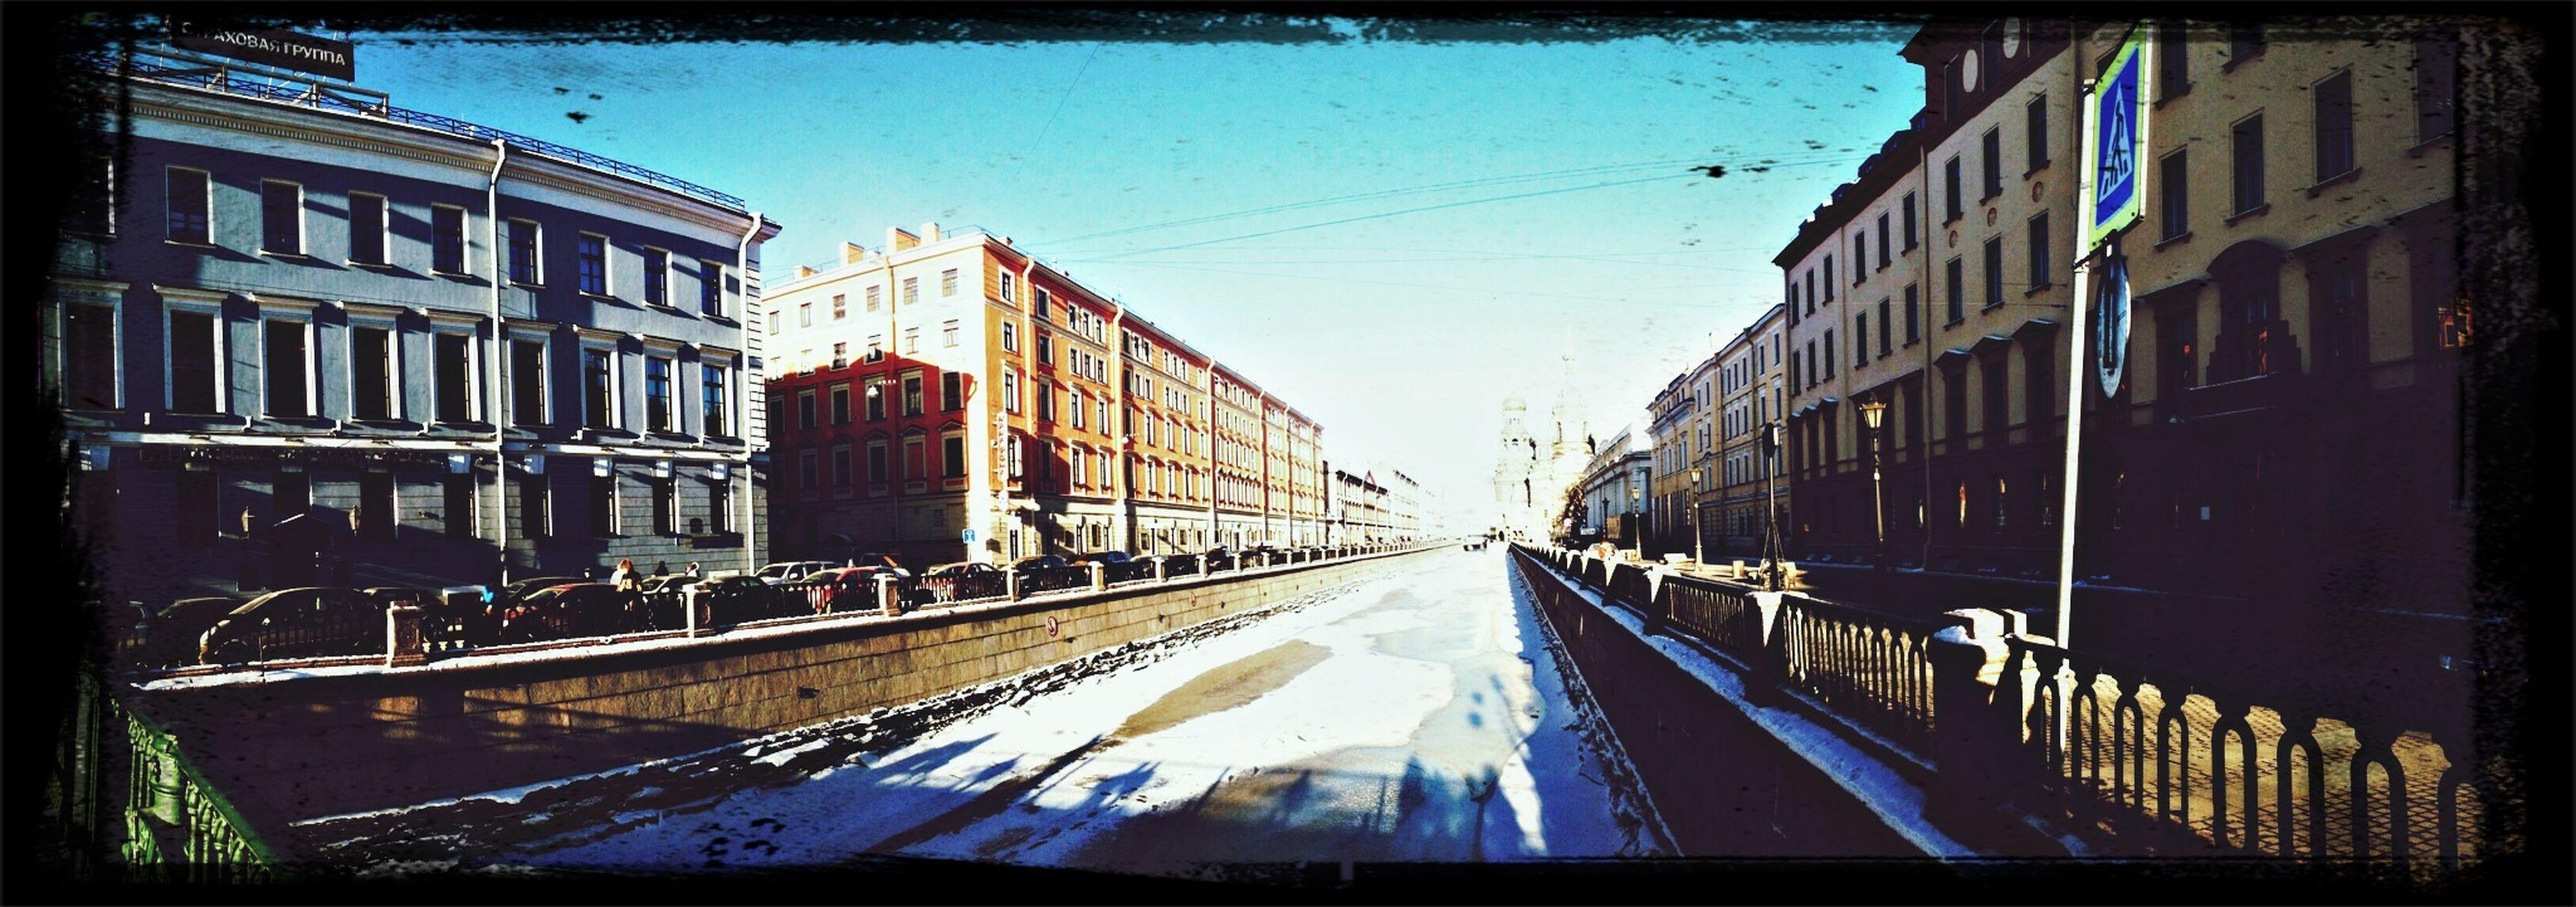 Hello World saint-Petersburg